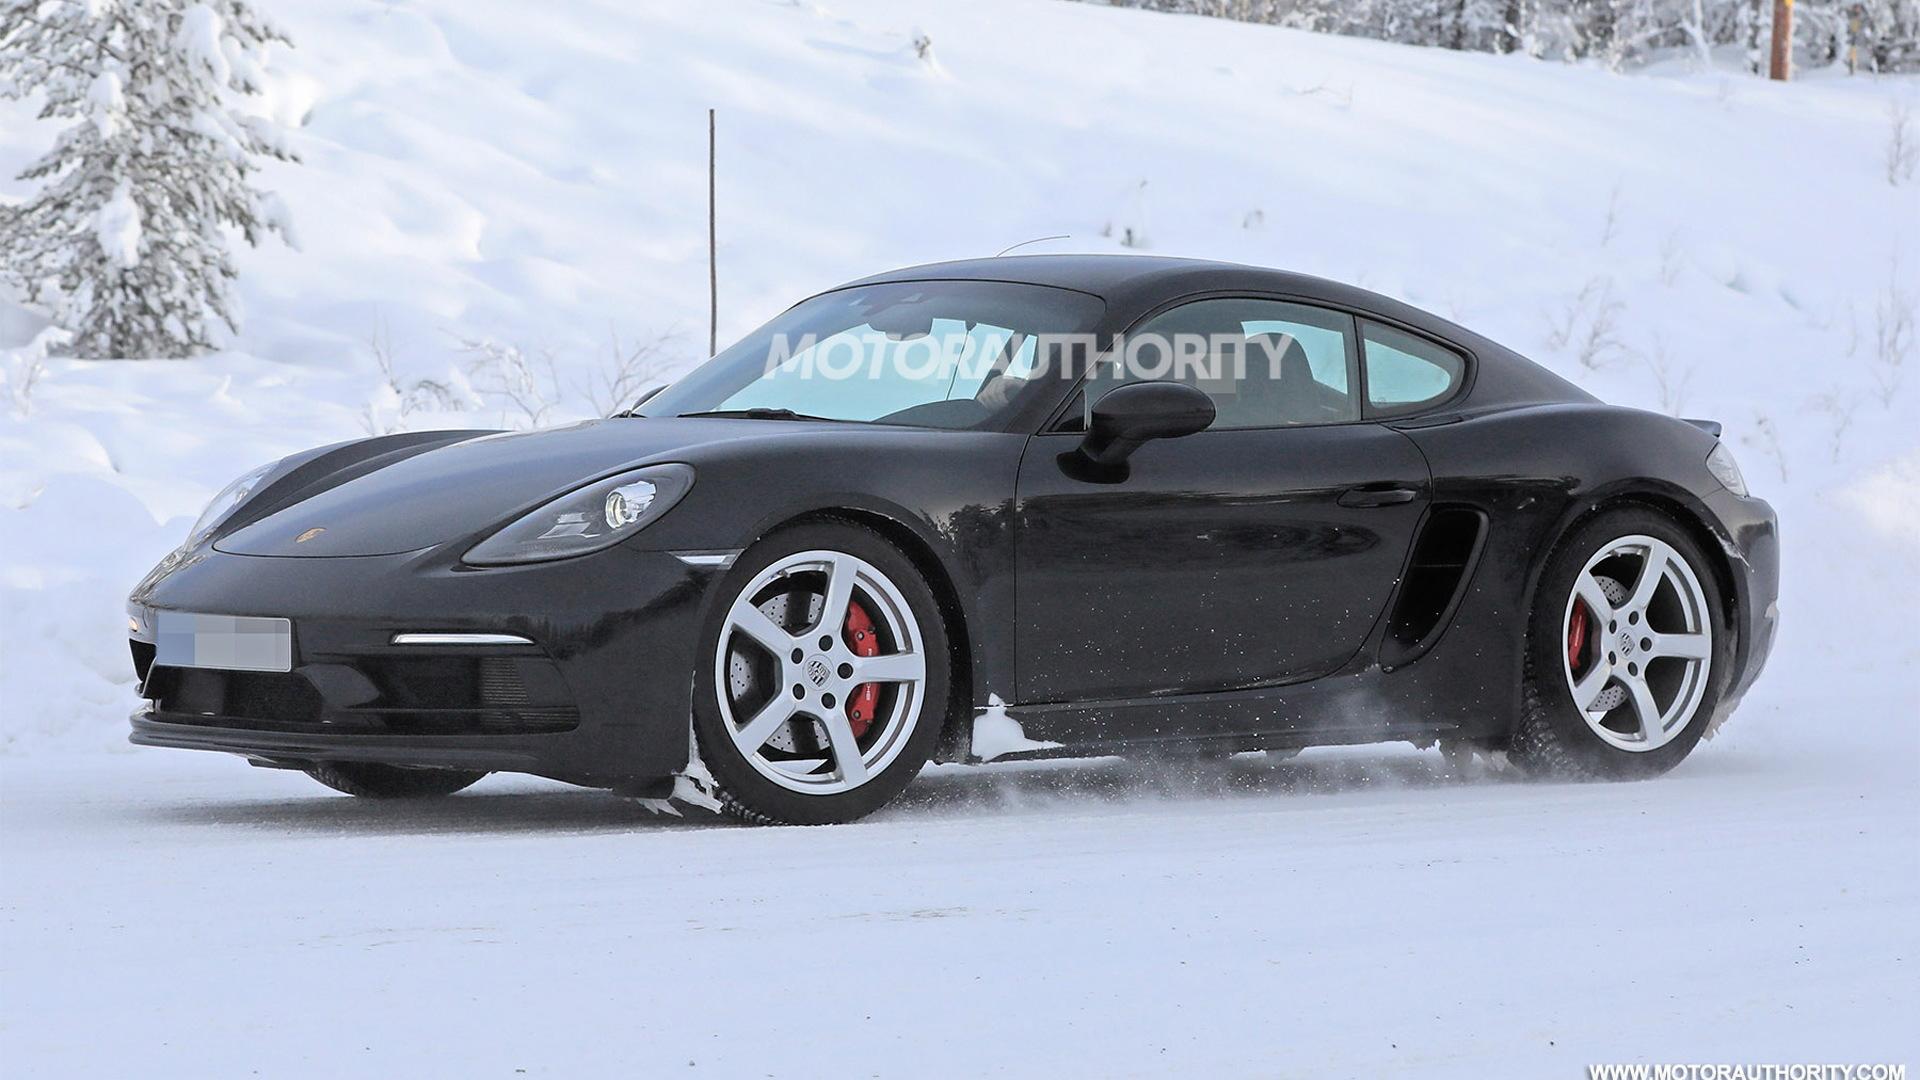 2020 Porsche 718 Cayman Touring spy shots - Image via S. Baldauf/SB-Medien